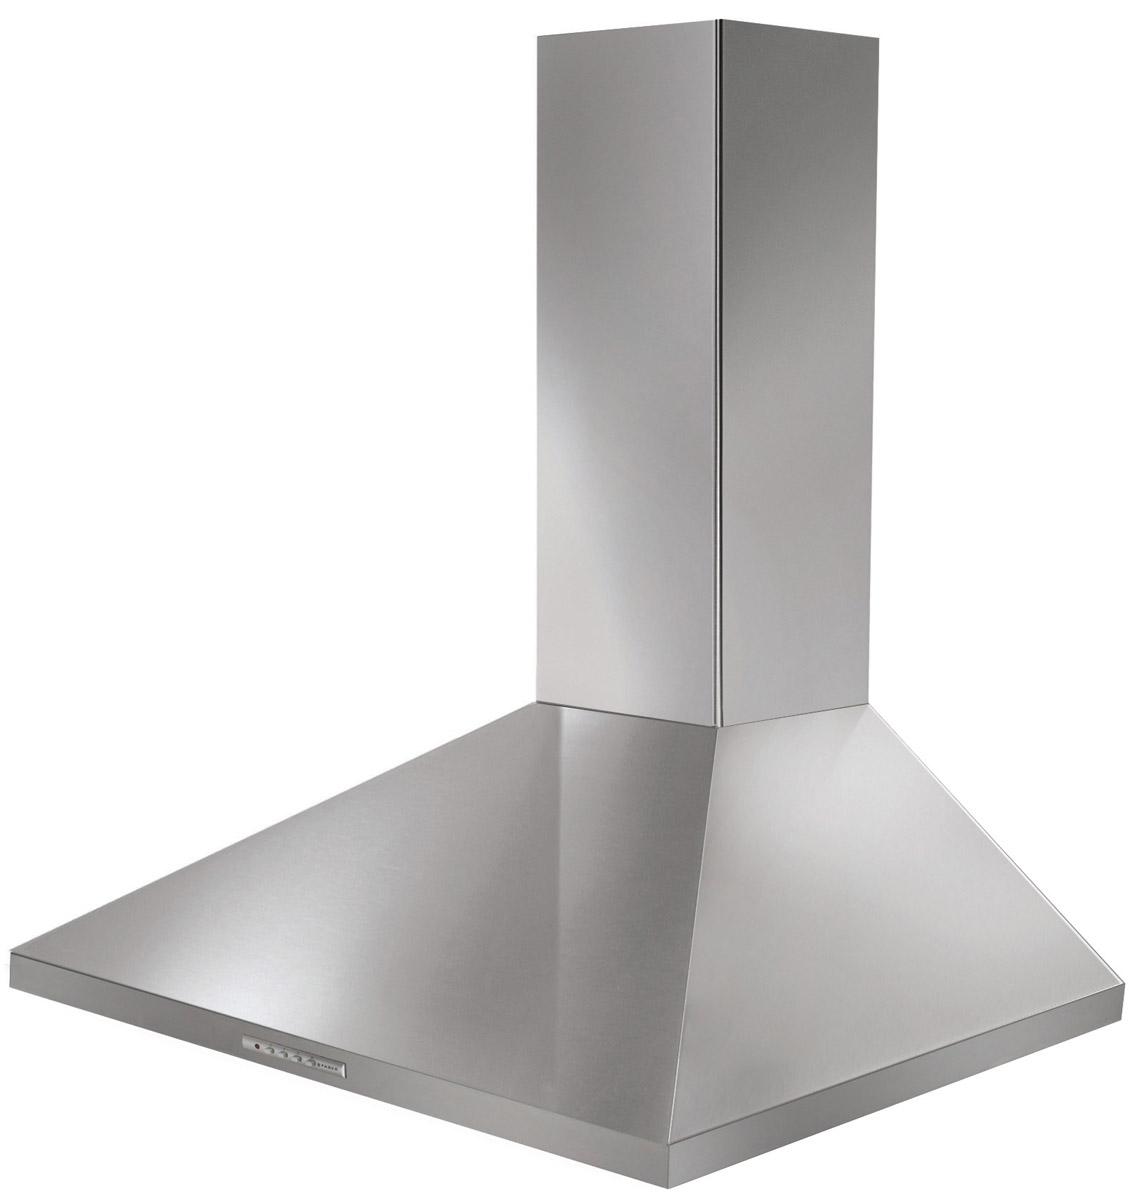 Вытяжка Faber Value PB 4 2L A60, steel цена